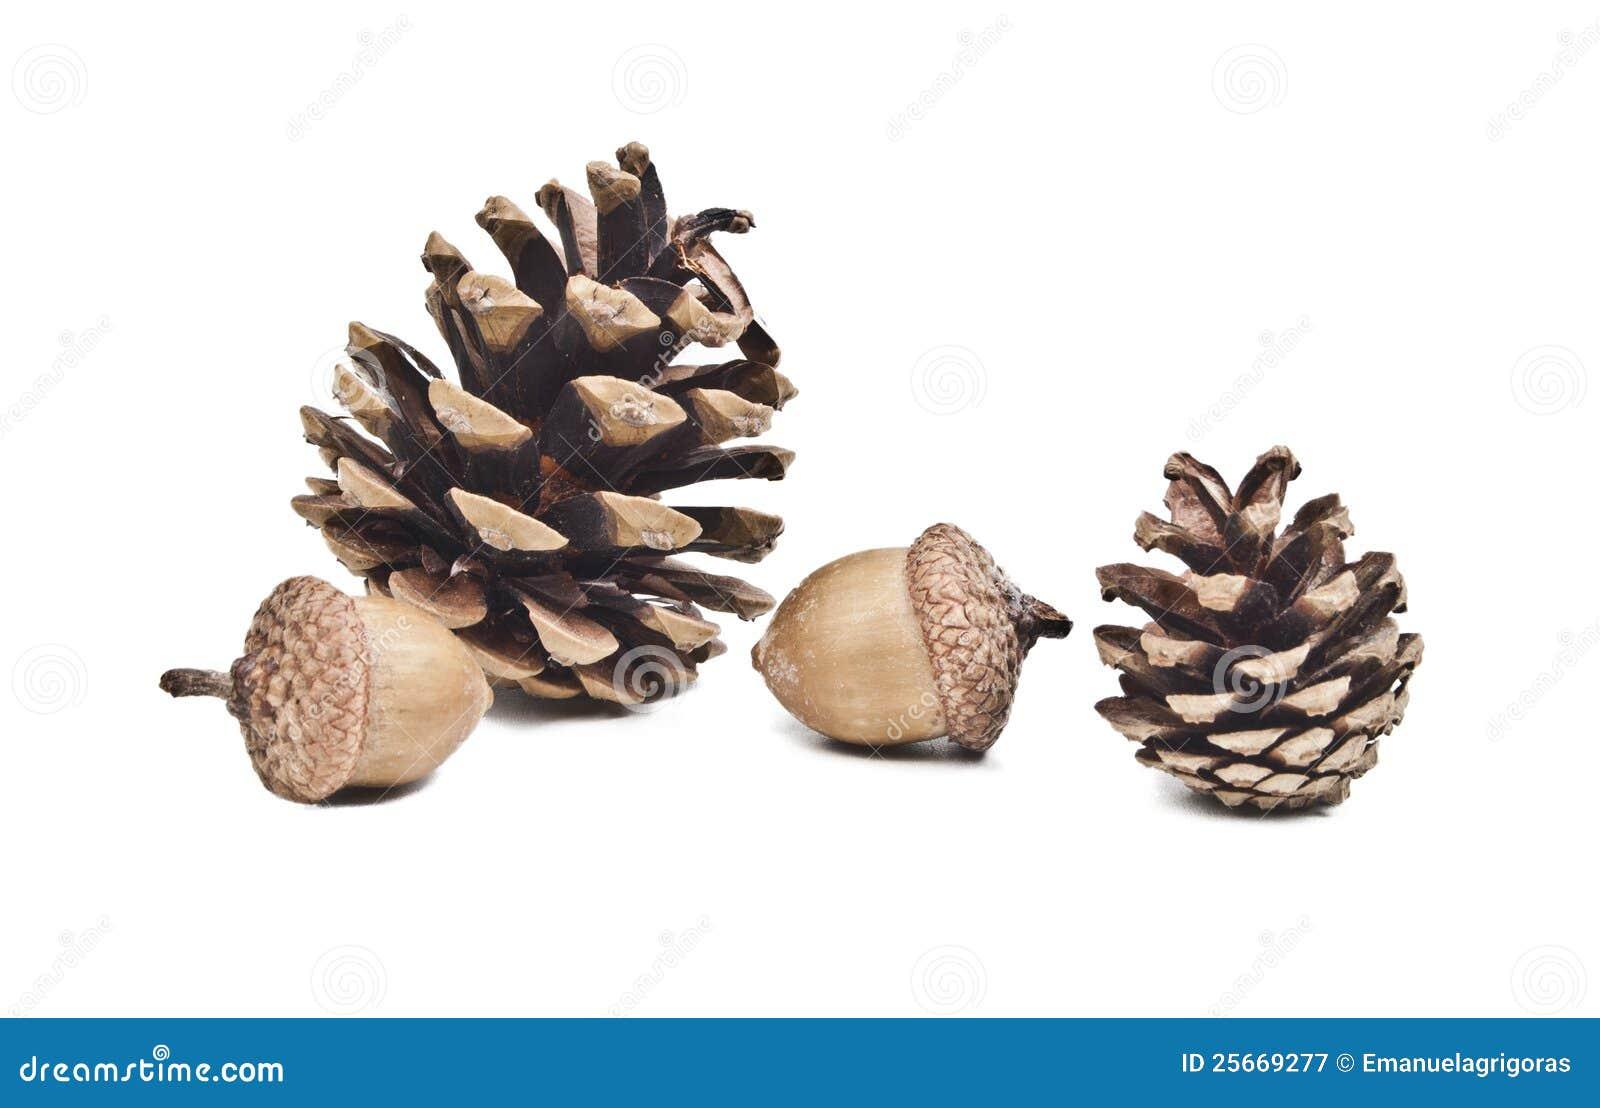 Pine cone and acorns stock illustration. Illustration of ...